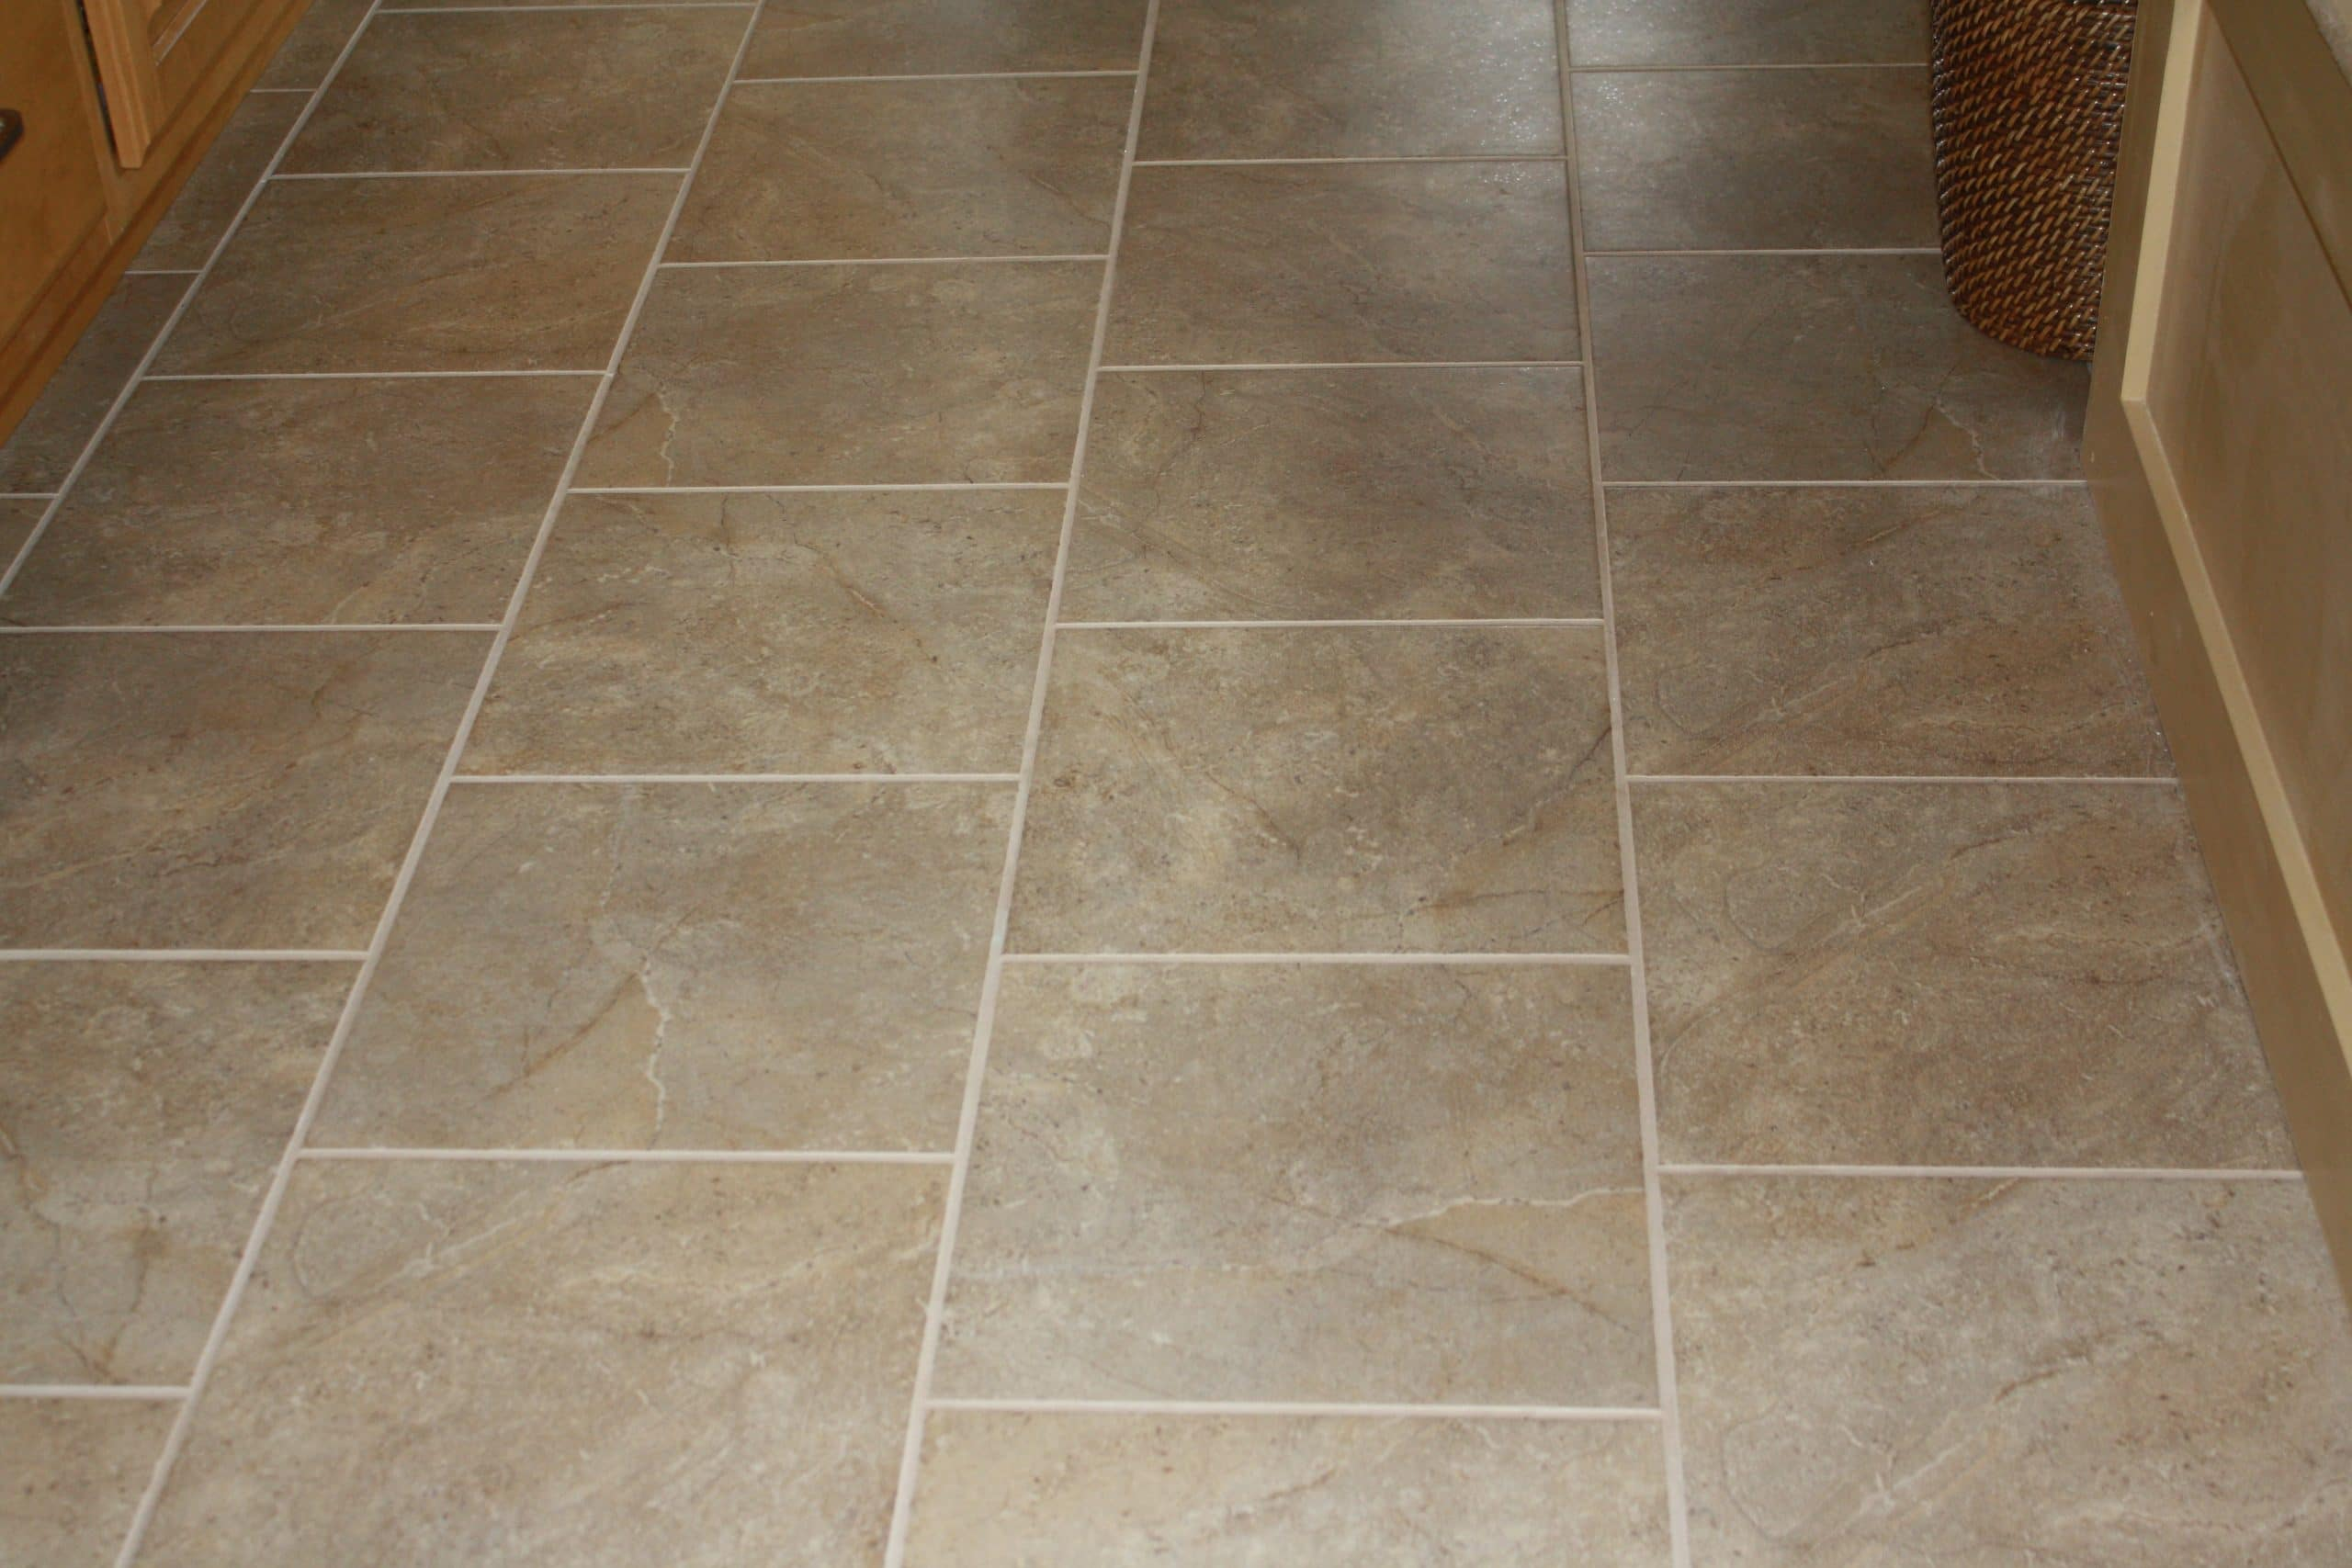 sealing grout on floors tile with porcelain gurus floor. Black Bedroom Furniture Sets. Home Design Ideas